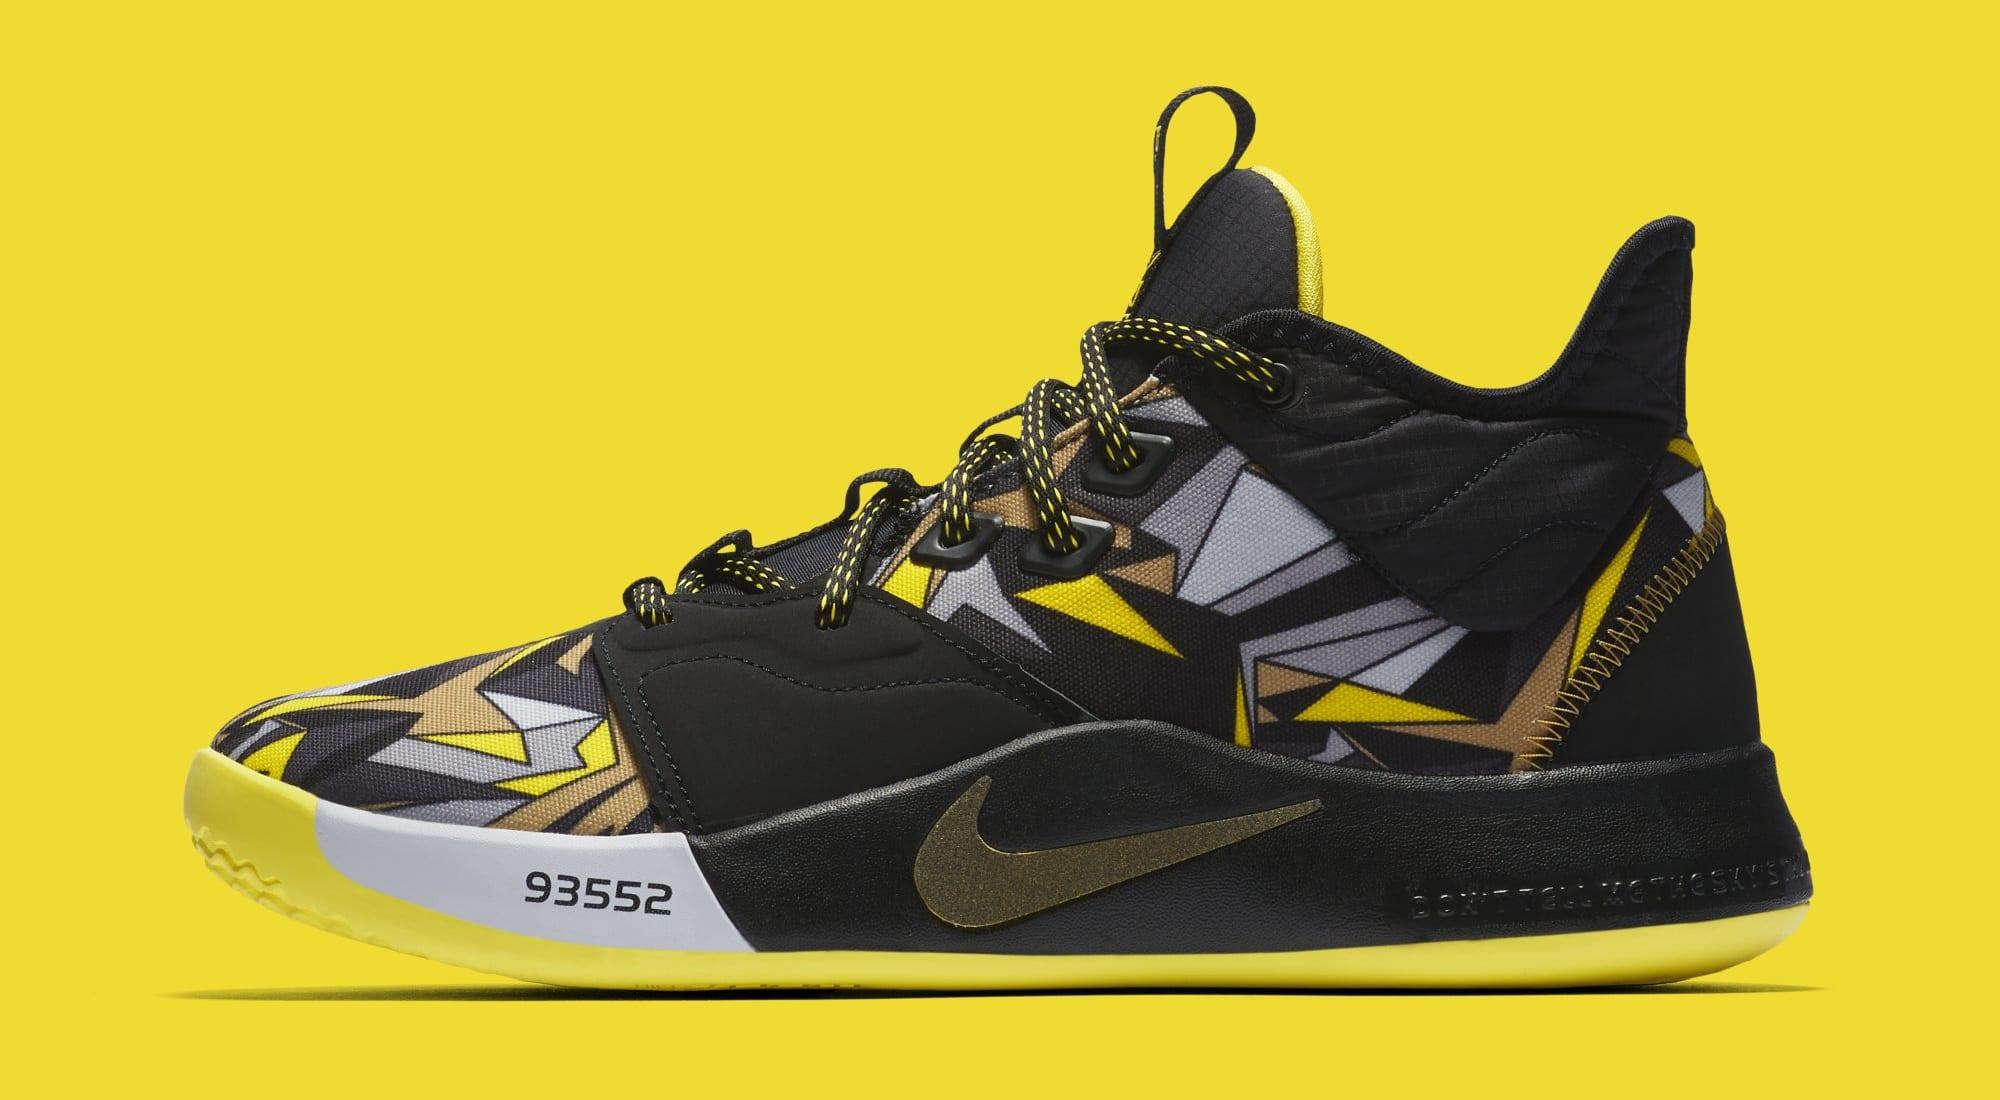 fe8949b05069 Nike PG 3  Mamba Mentality  Multi-Color Opti Yellow AO2607-900 ...